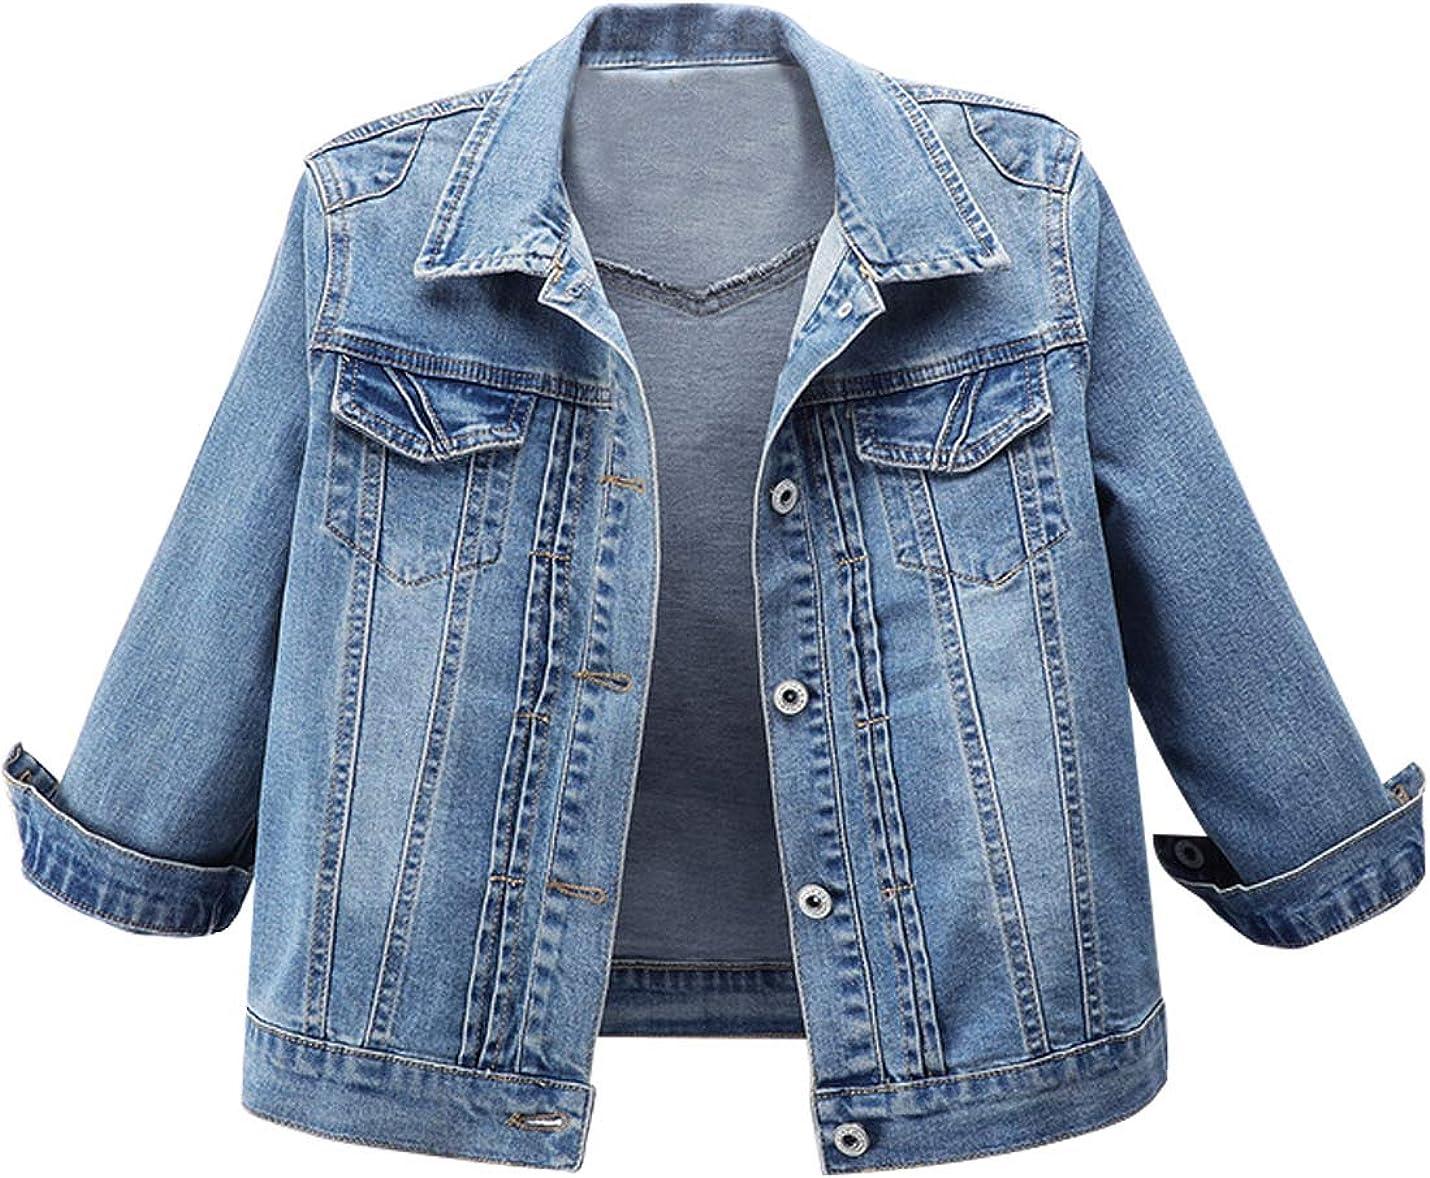 AMEBELLE Women's 3/4 Sleeve Strech Distress Slim Crop Denim Jean Trucker Jacket